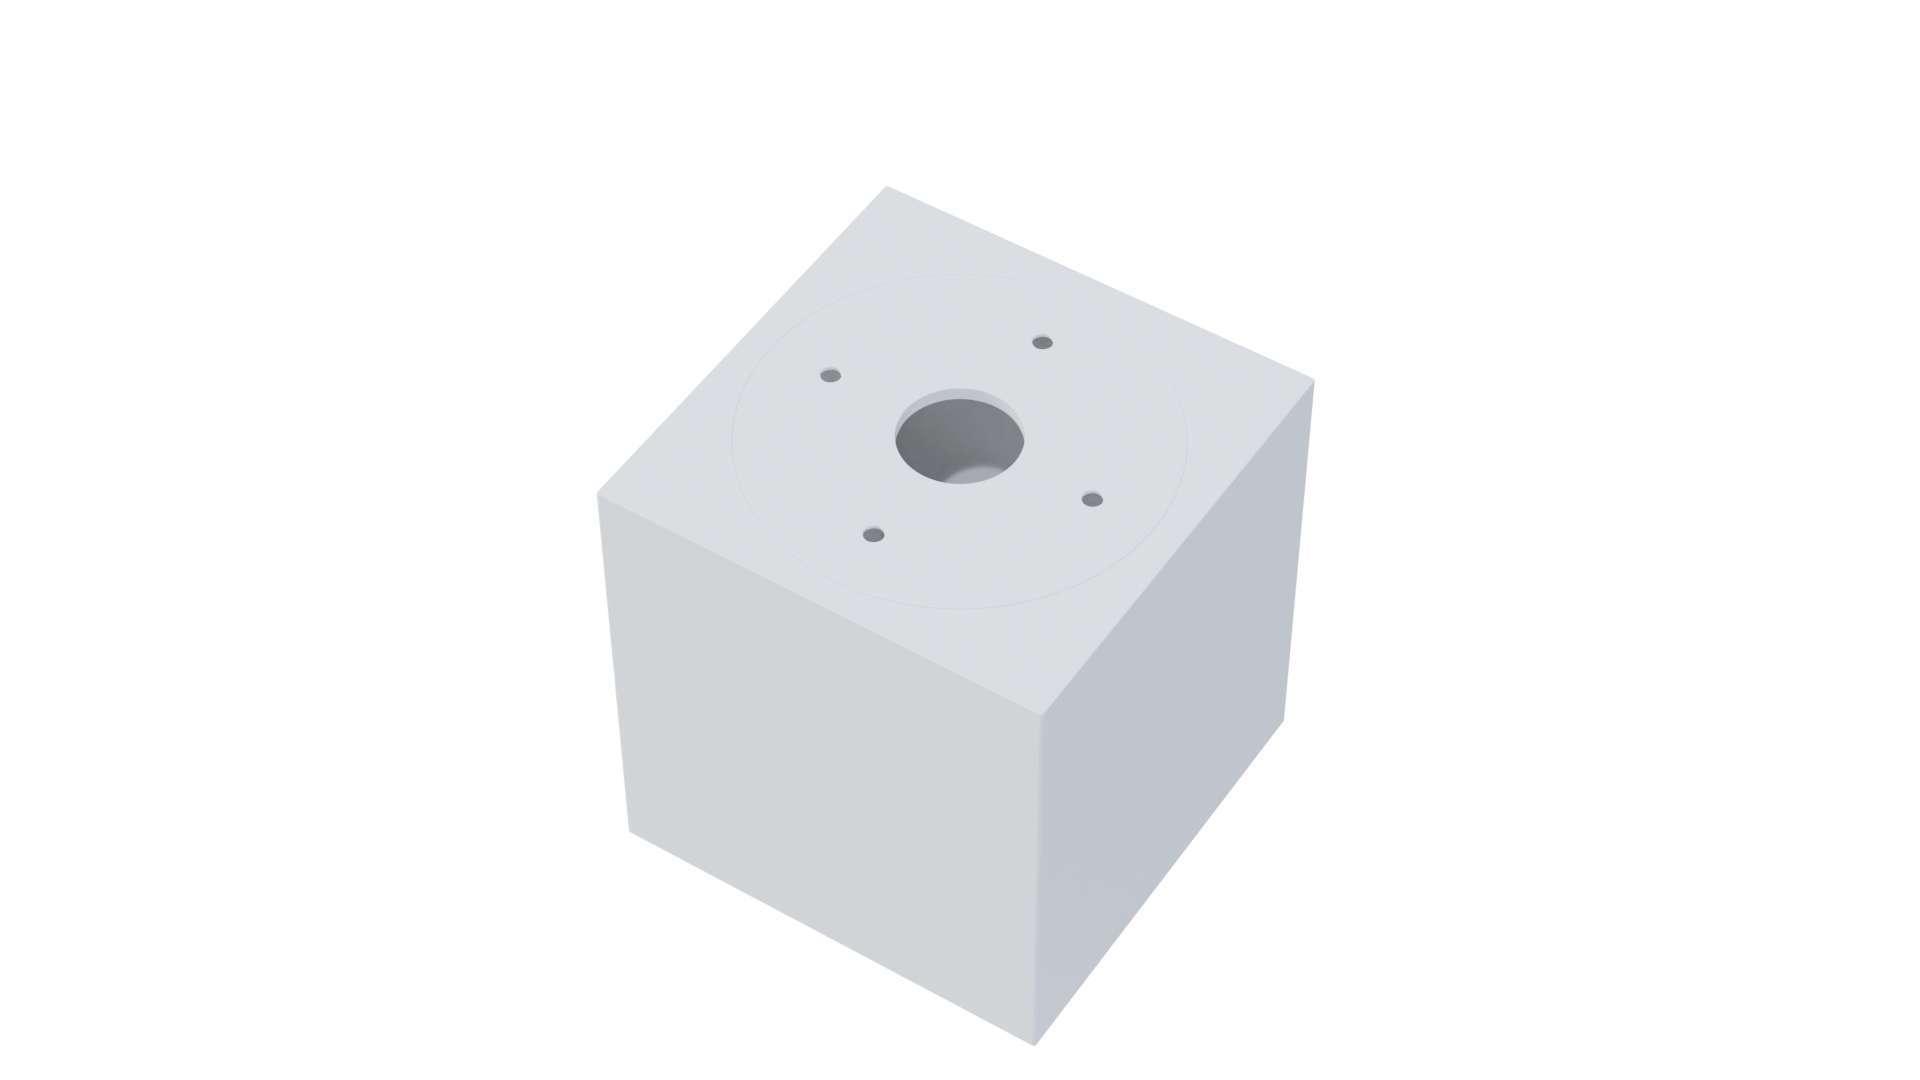 Ceiling spotlight fixture SPOT NORD square white